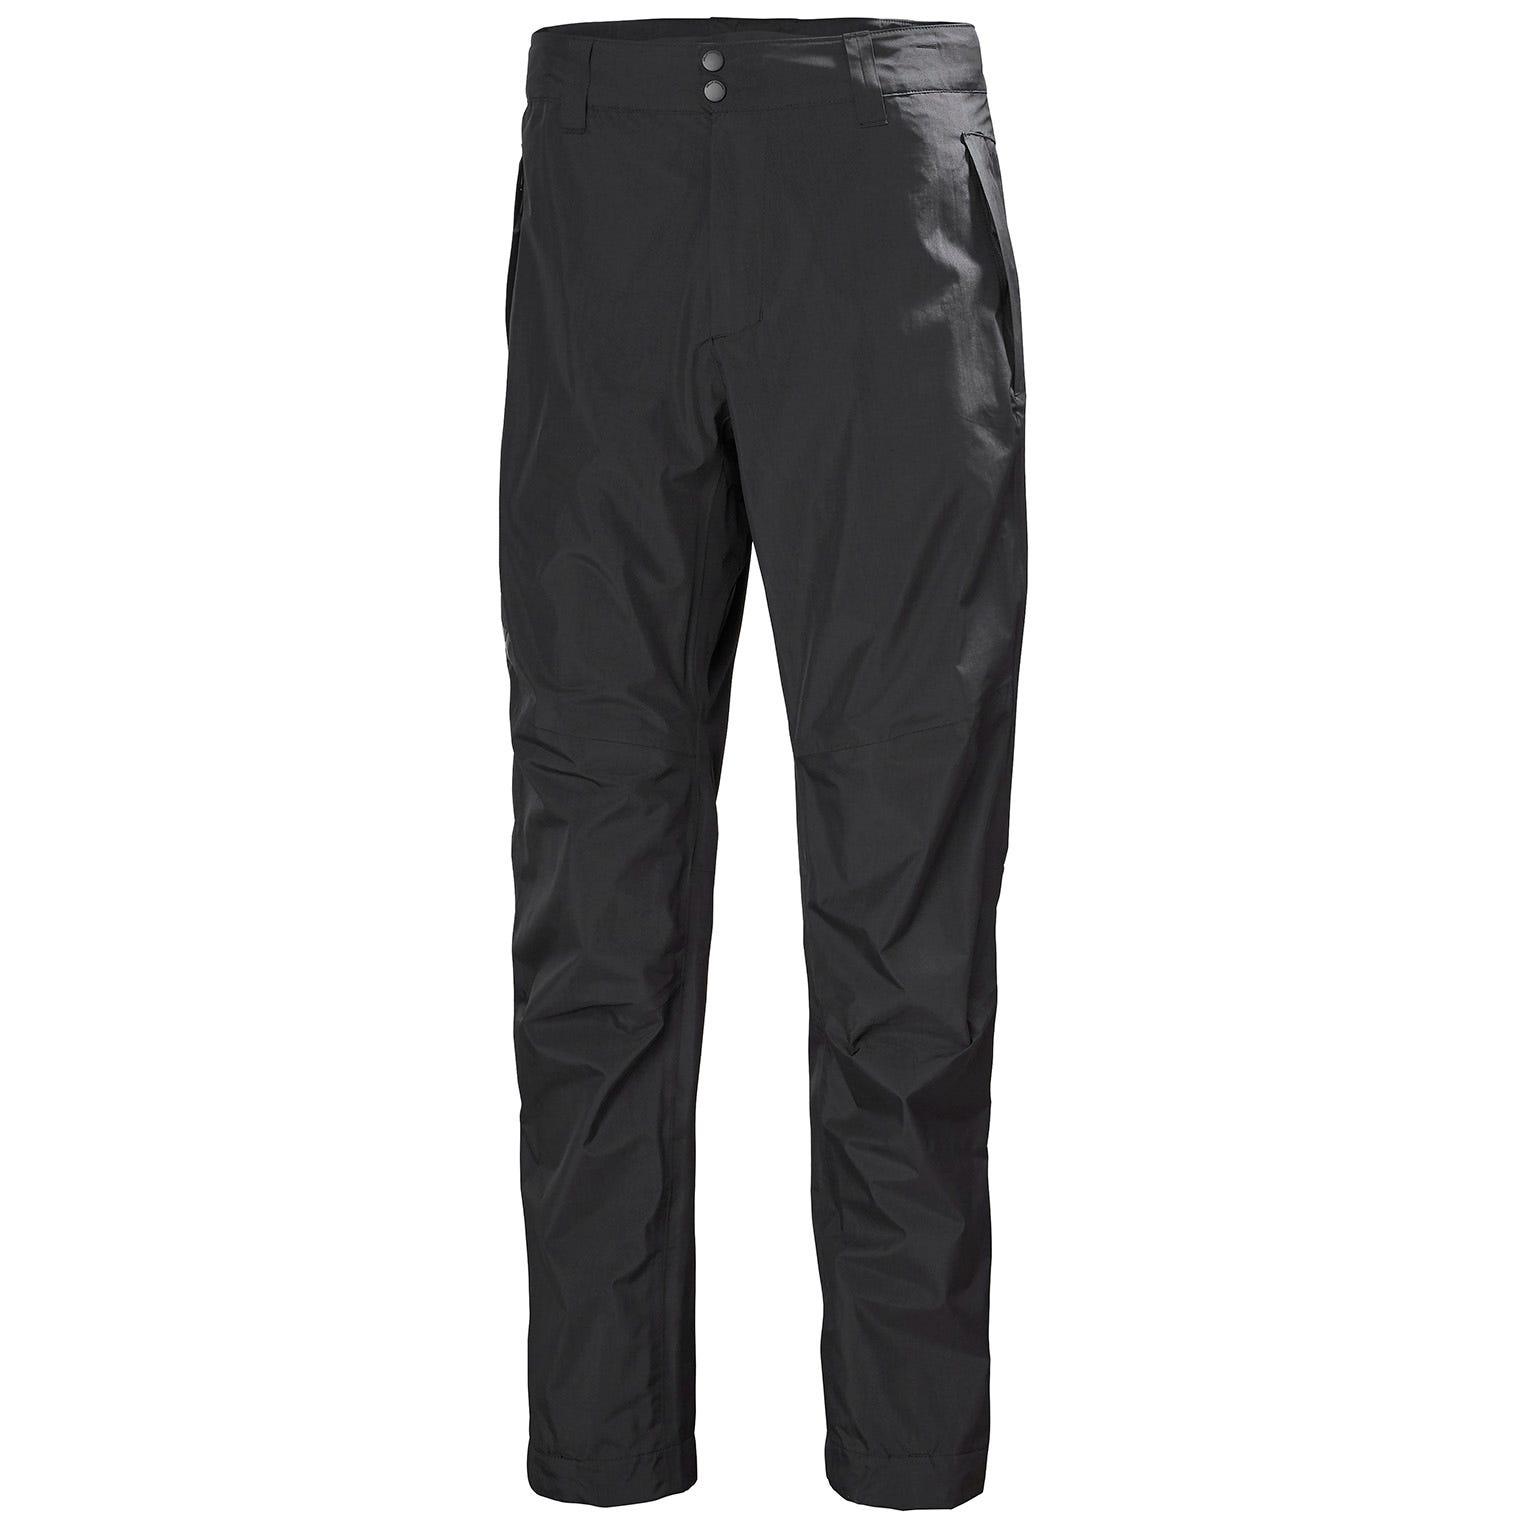 Helly Hansen Mens Verglas 2l Ripstop Shell Trousers XXL